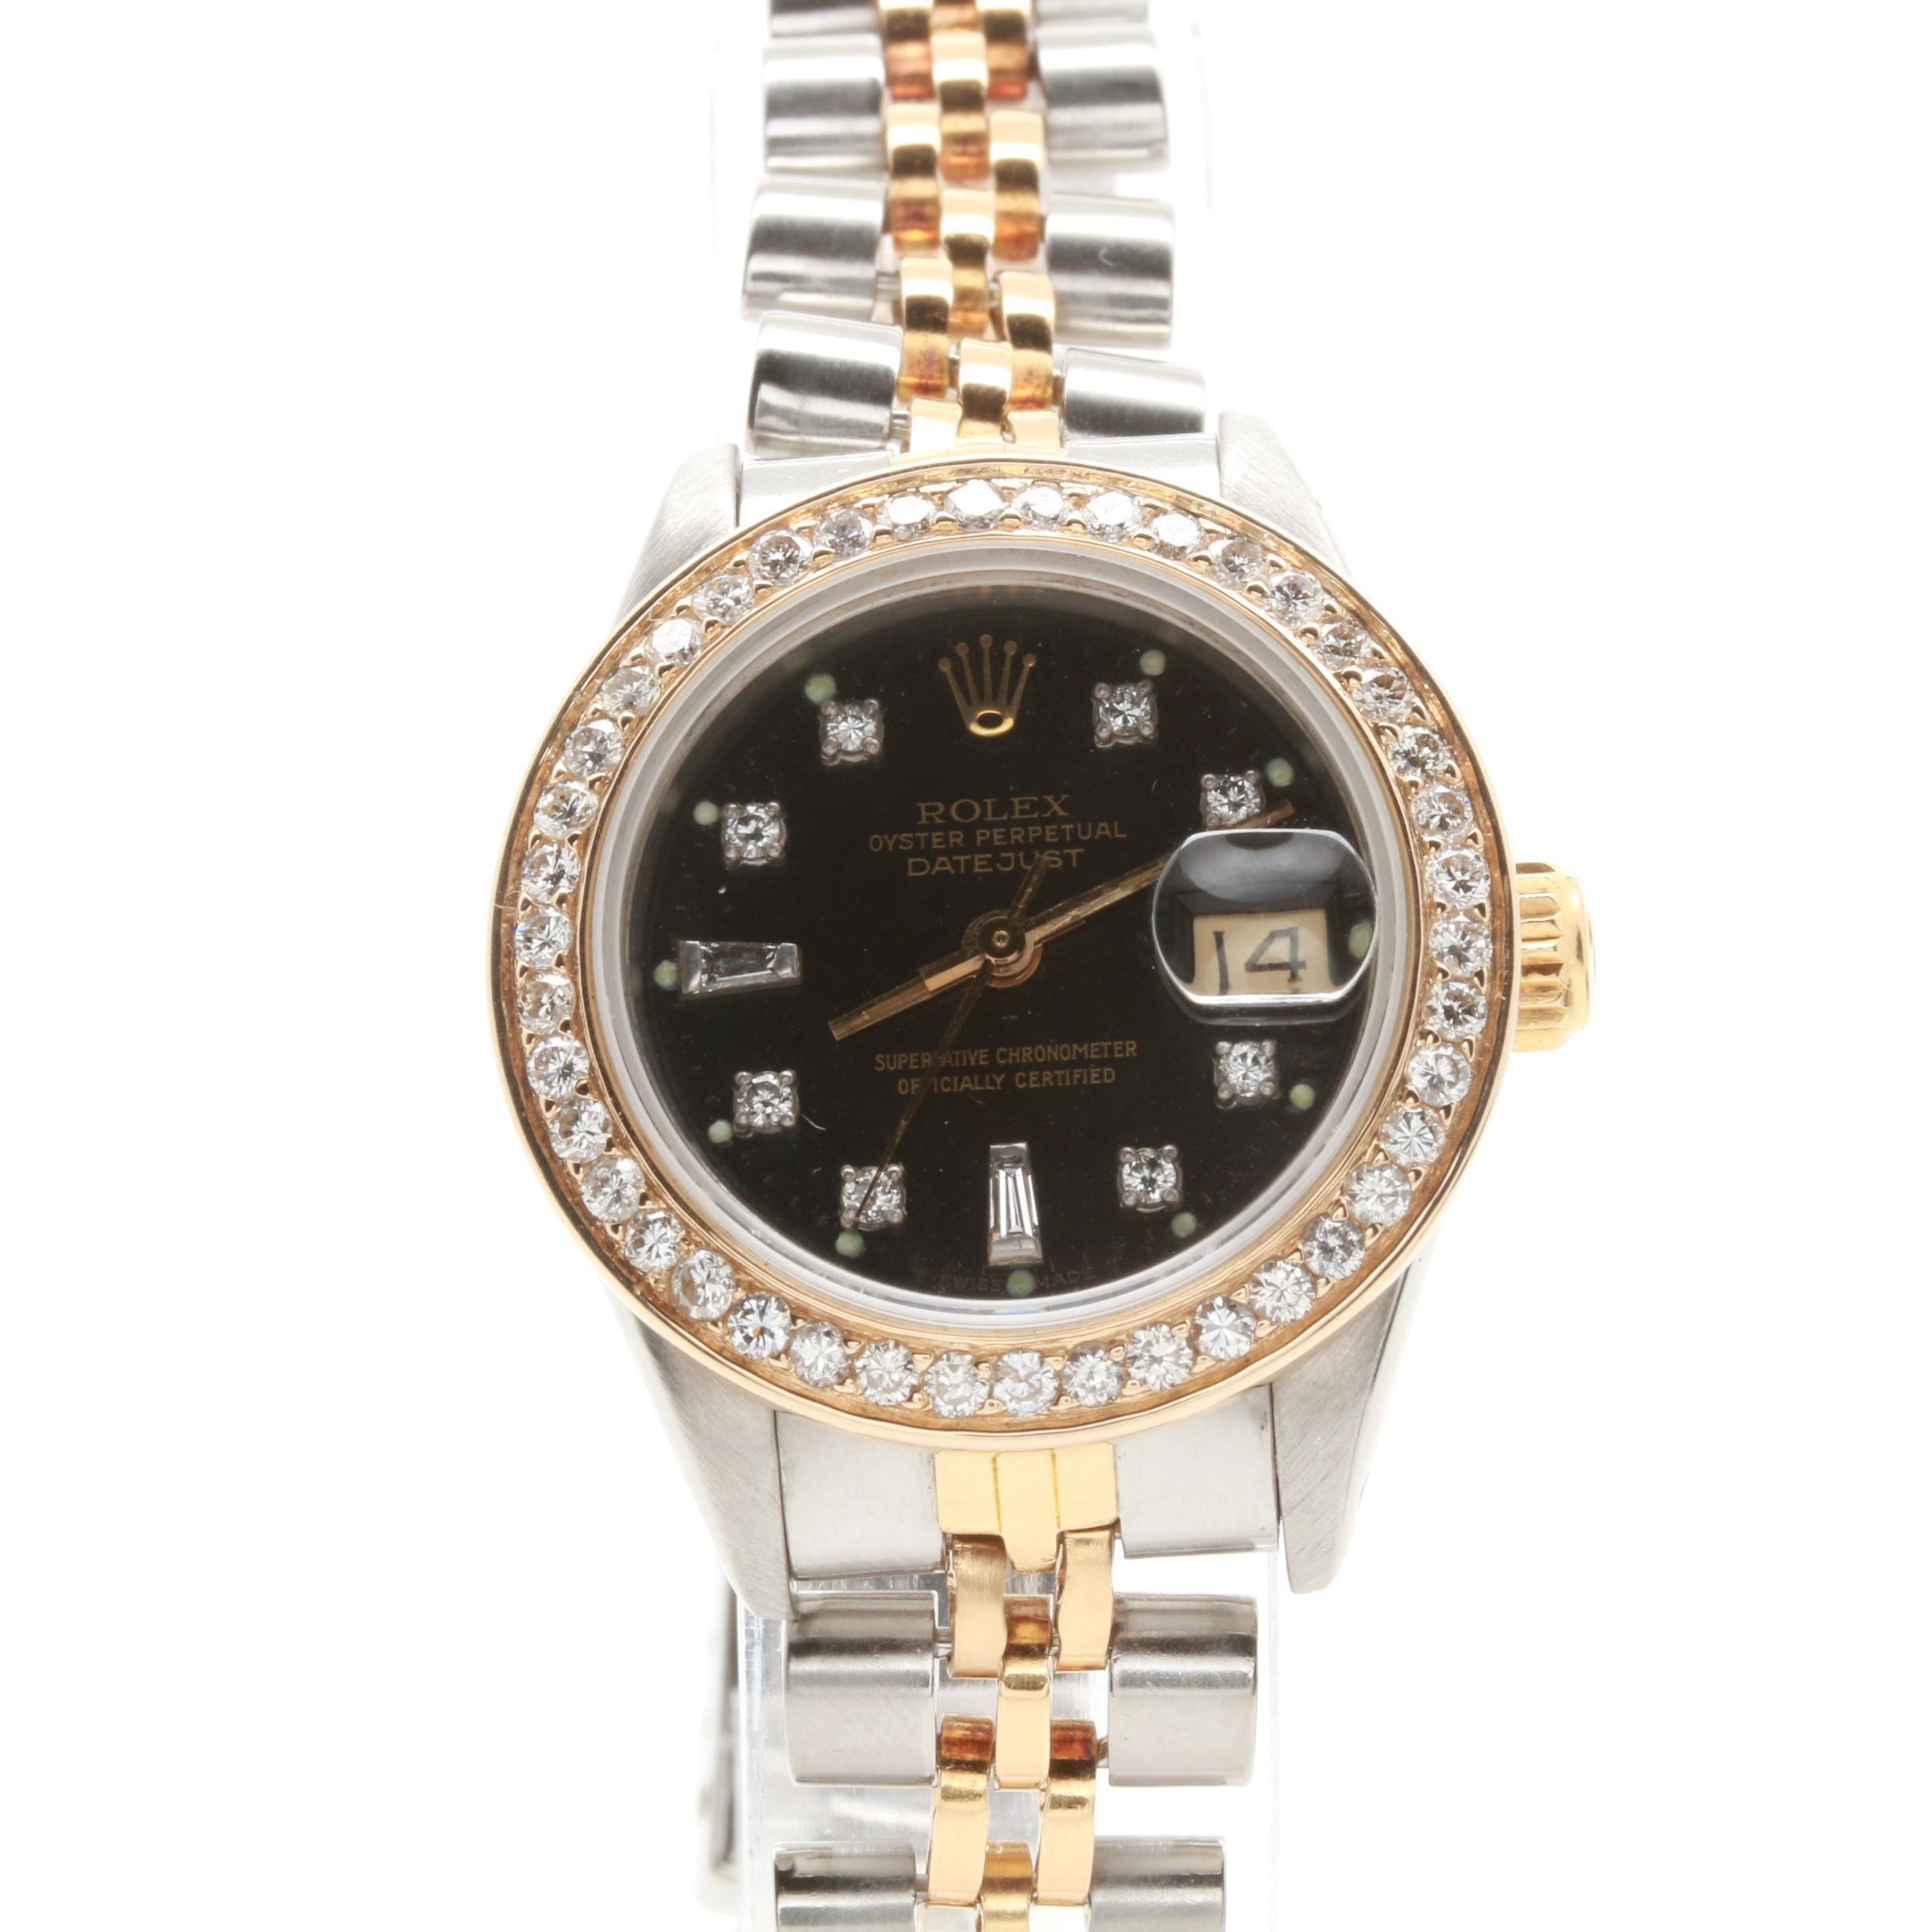 Circa 1986 Rolex Stainless Steel and 18K Yellow Gold 1.04 CTW Diamond Wristwatch